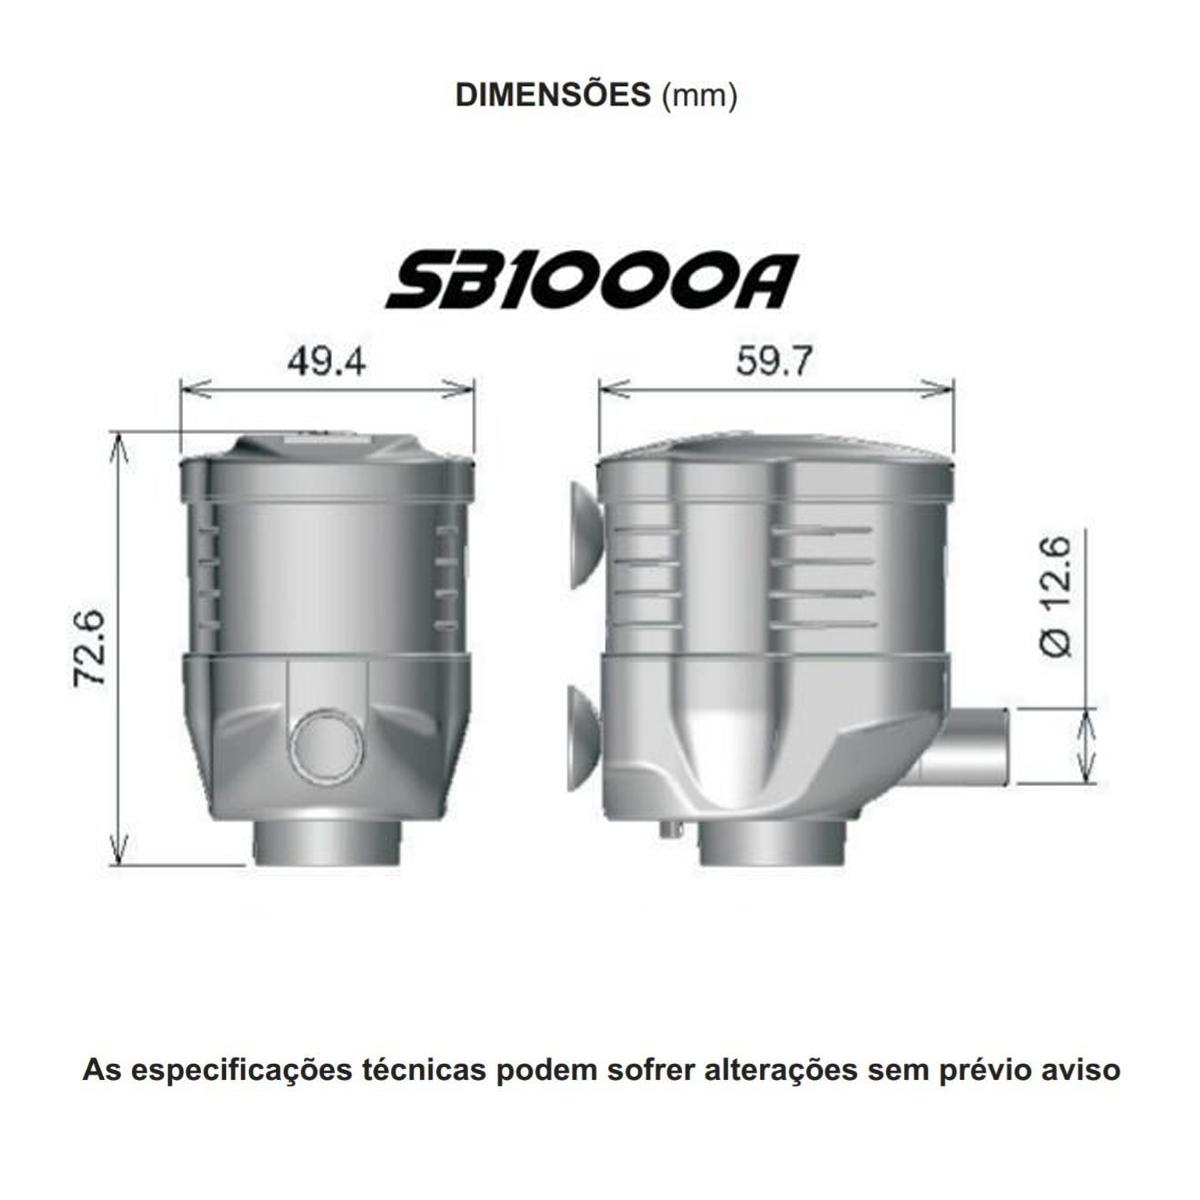 Bomba Submersa Sarlo Better SB 1000a